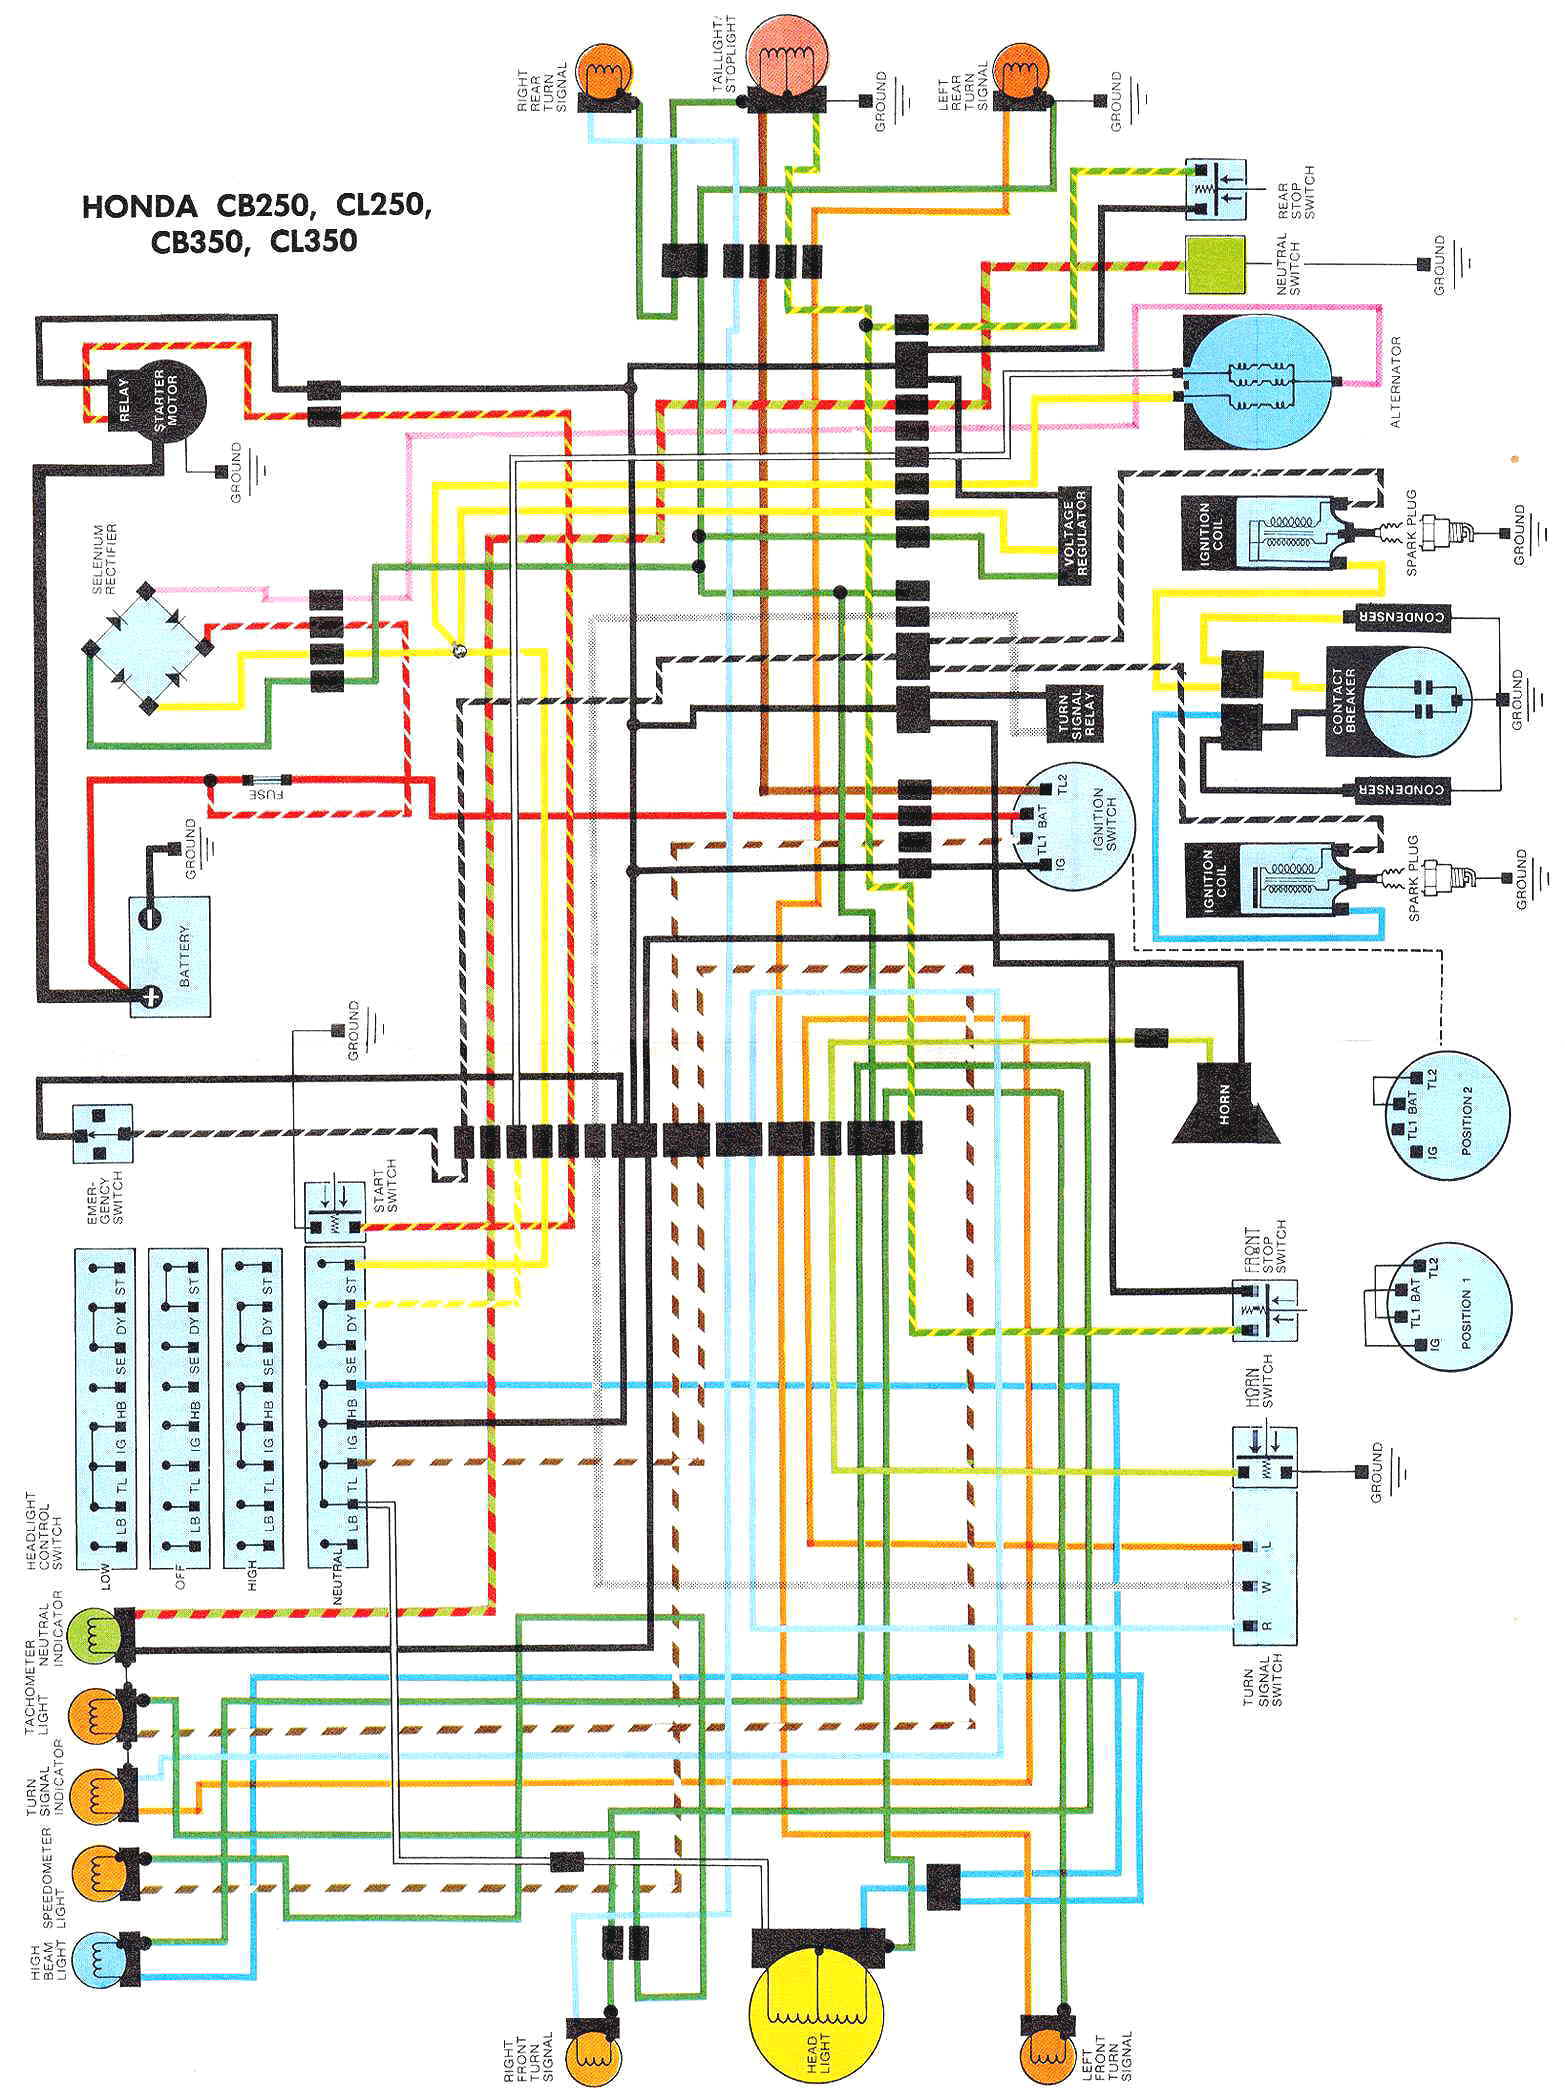 73 cb350g right switch wiring rh hondatwins net 71 Honda 450 1971 Honda CB450 Scrambler